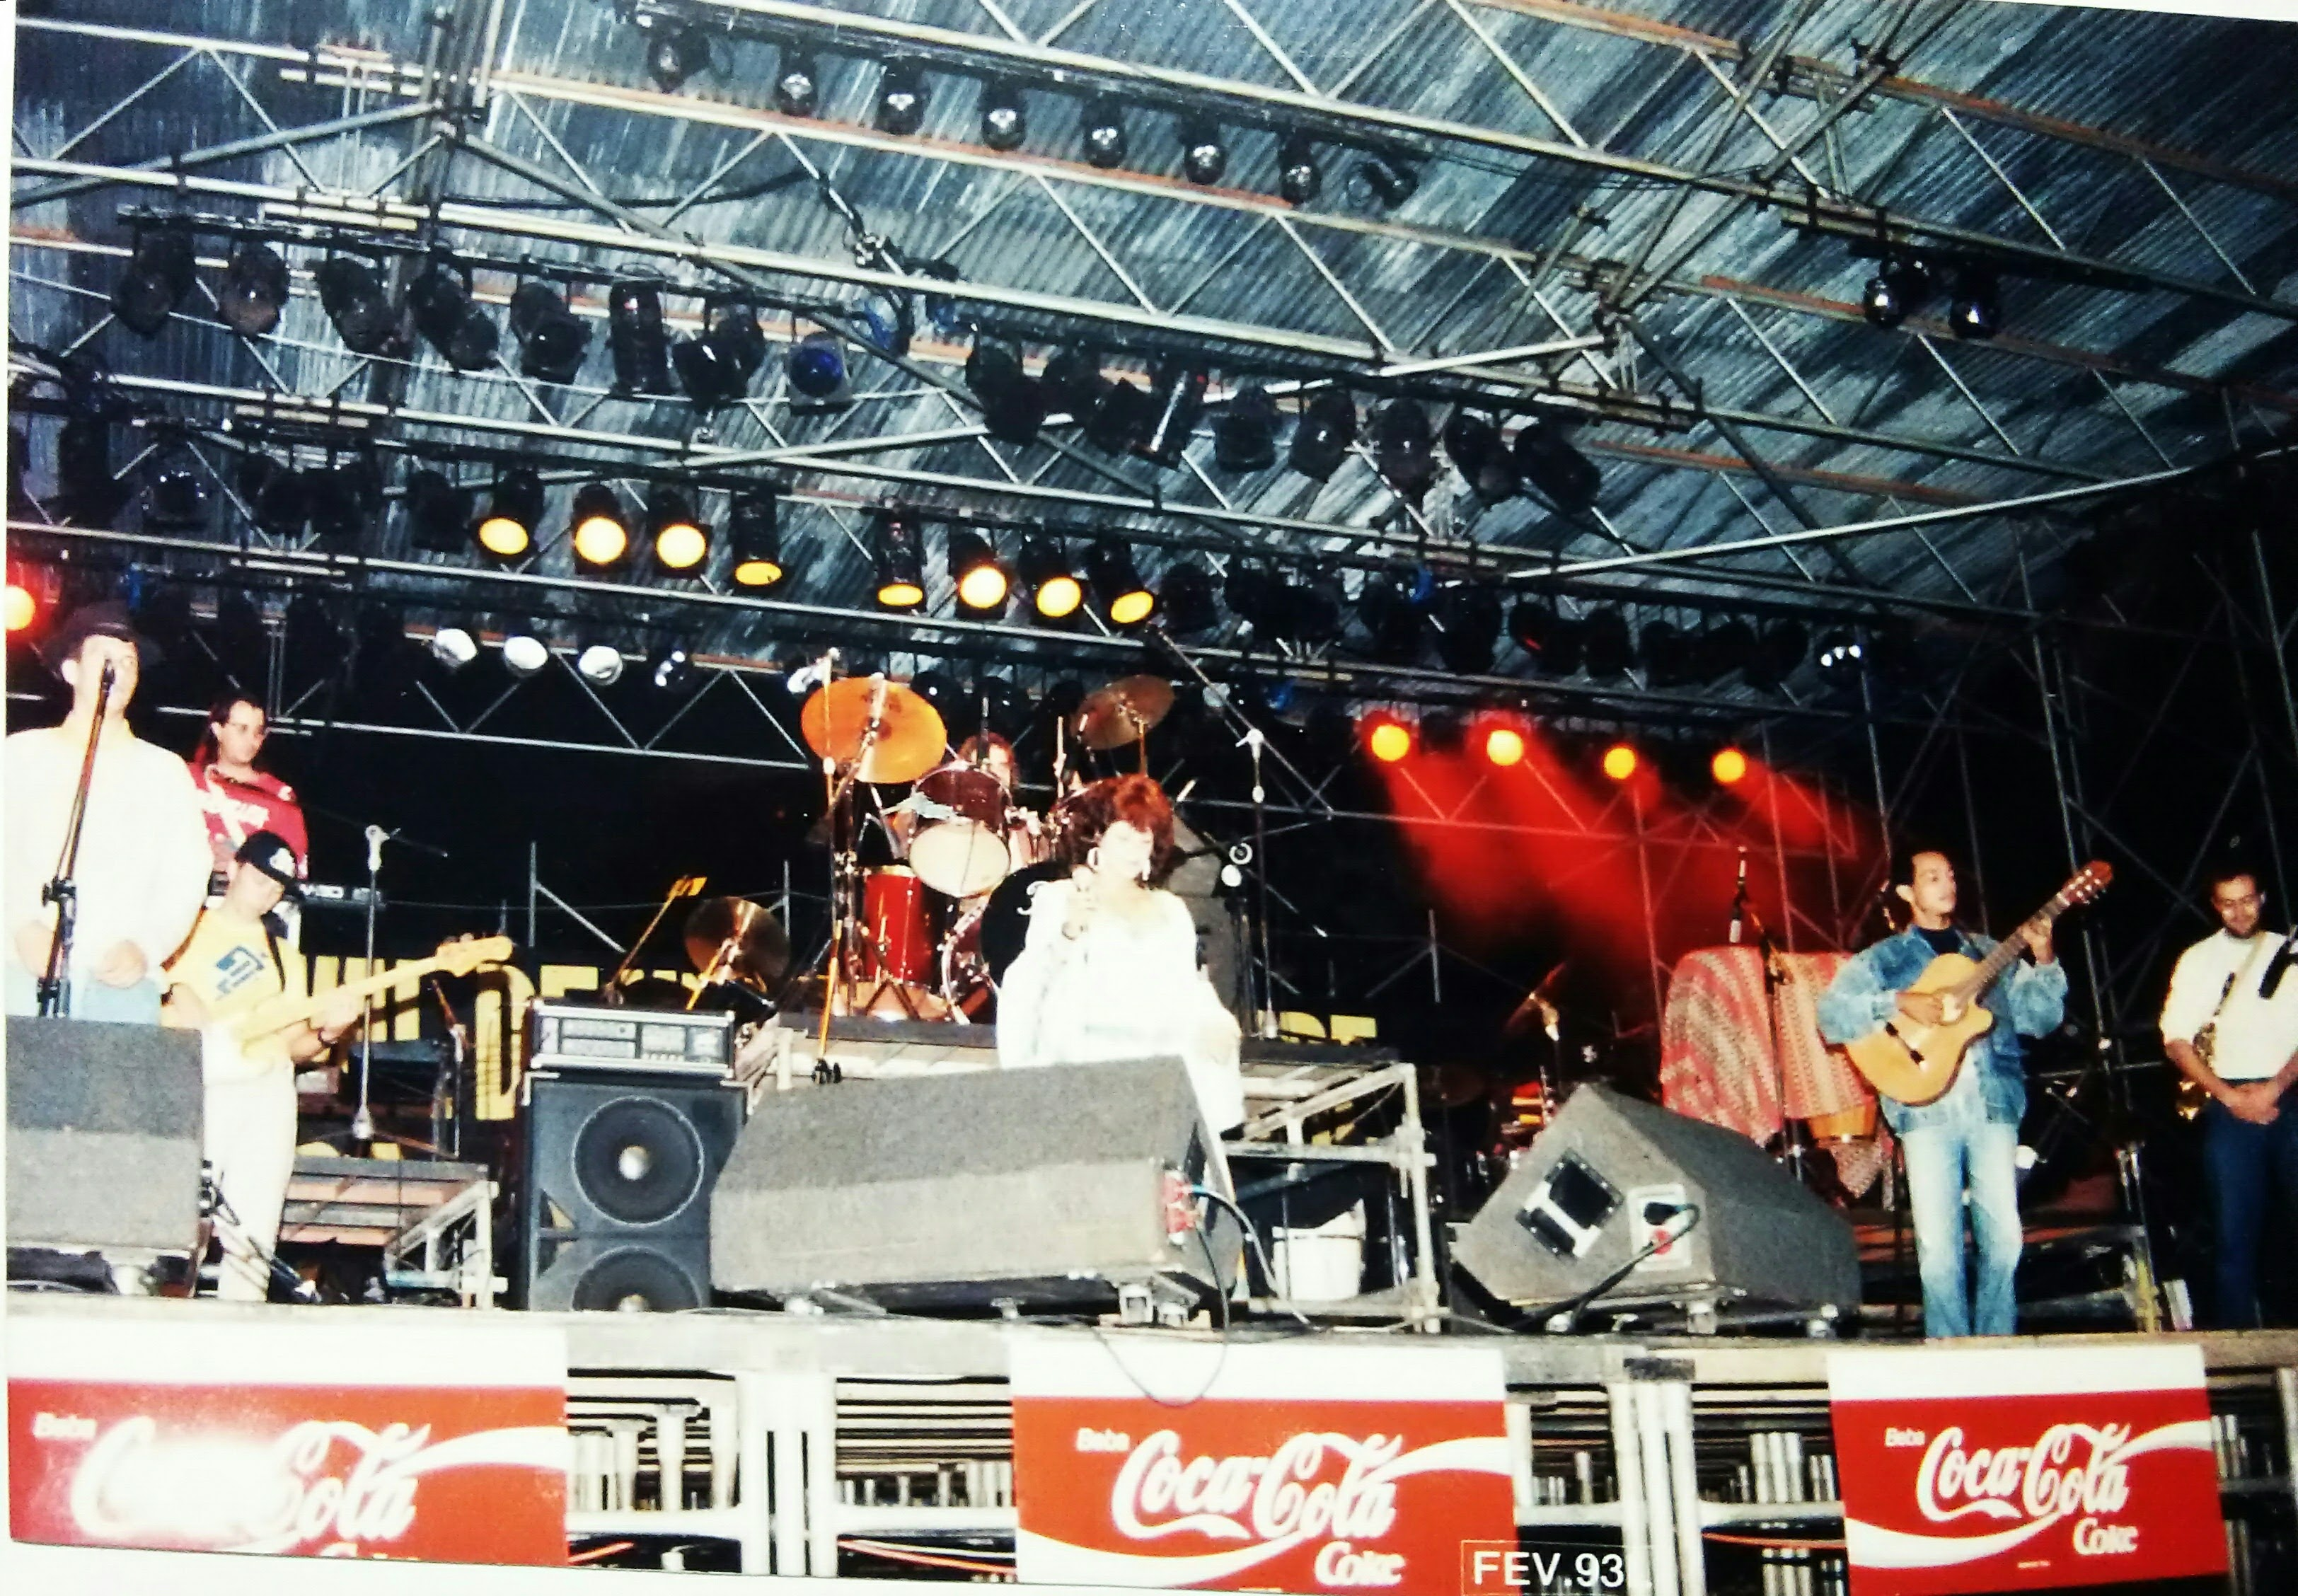 1993_Festival de Musica de Alegre _ musica Caparaó (4)